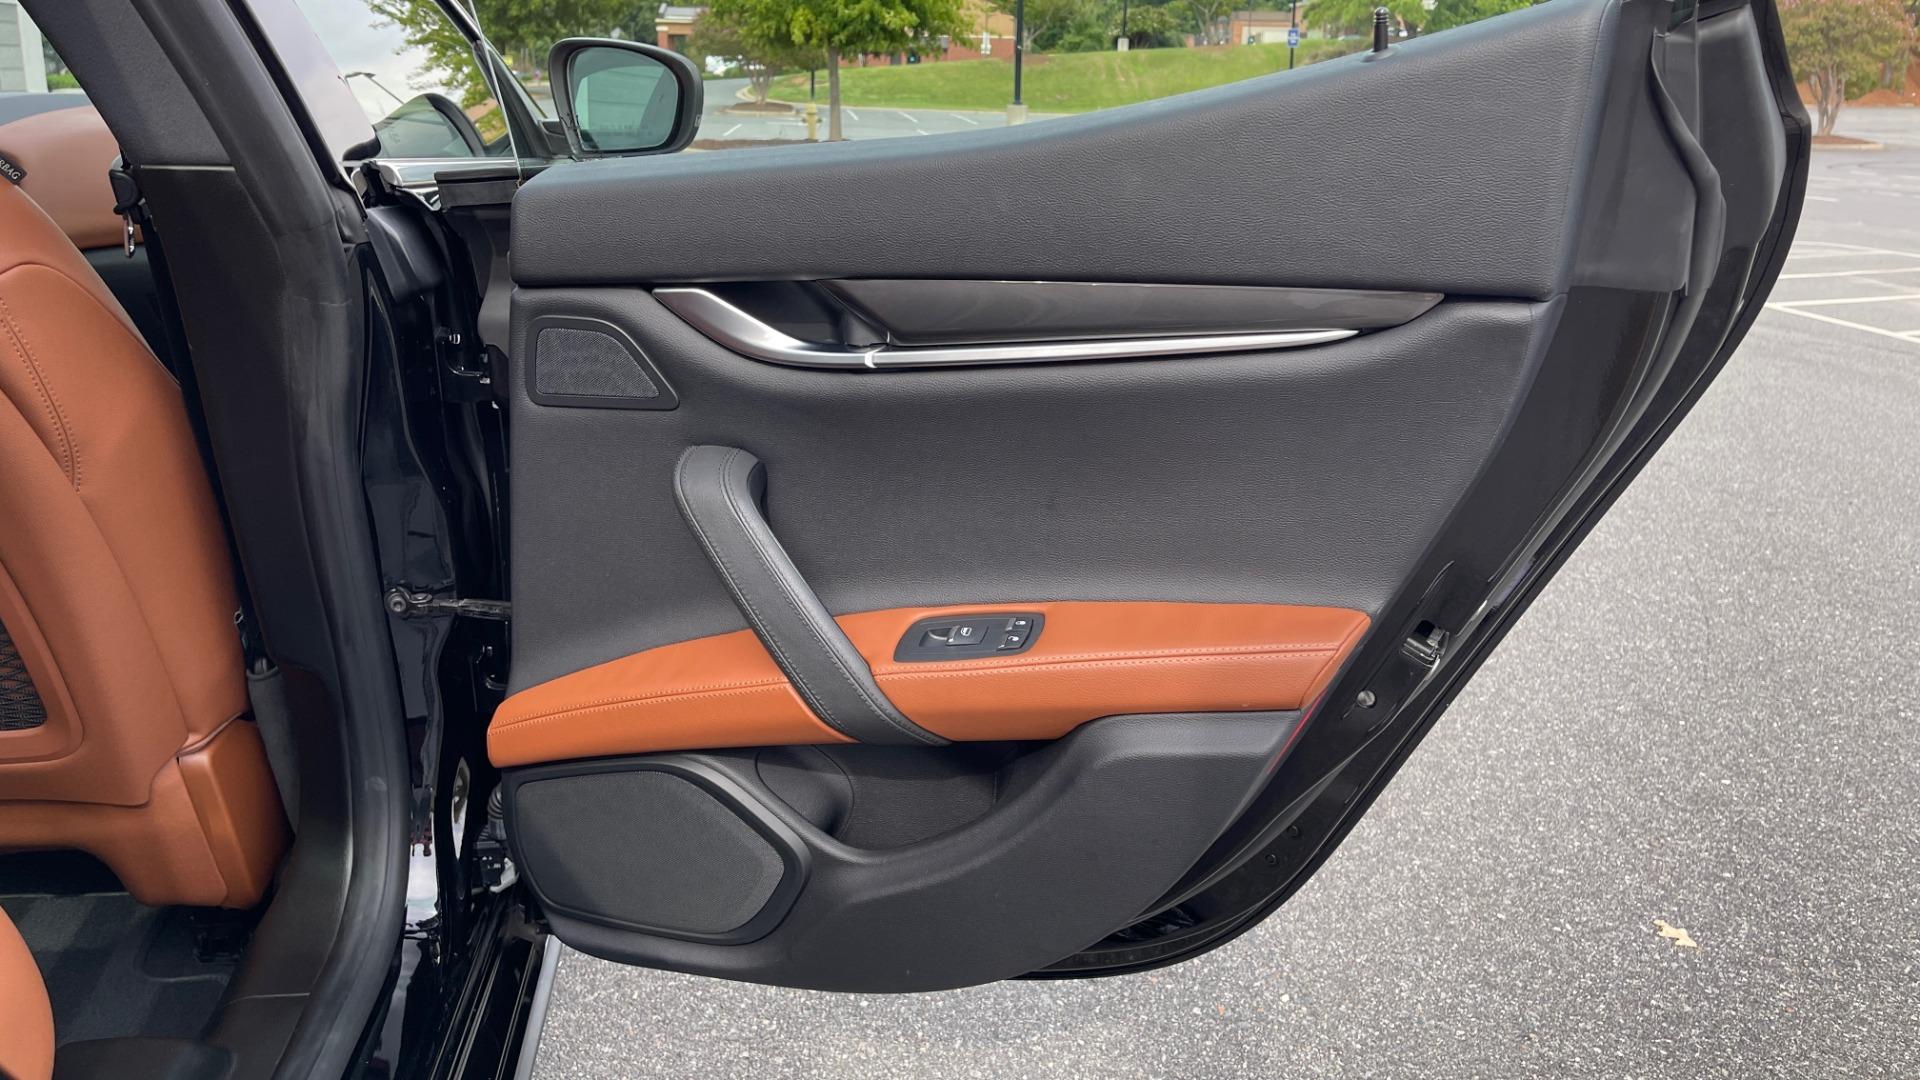 Used 2018 Maserati GHIBLI 3.0L SEDAN / 8-SPD AUTO / NAV / SUNROOF / REARVIEW for sale $42,995 at Formula Imports in Charlotte NC 28227 53